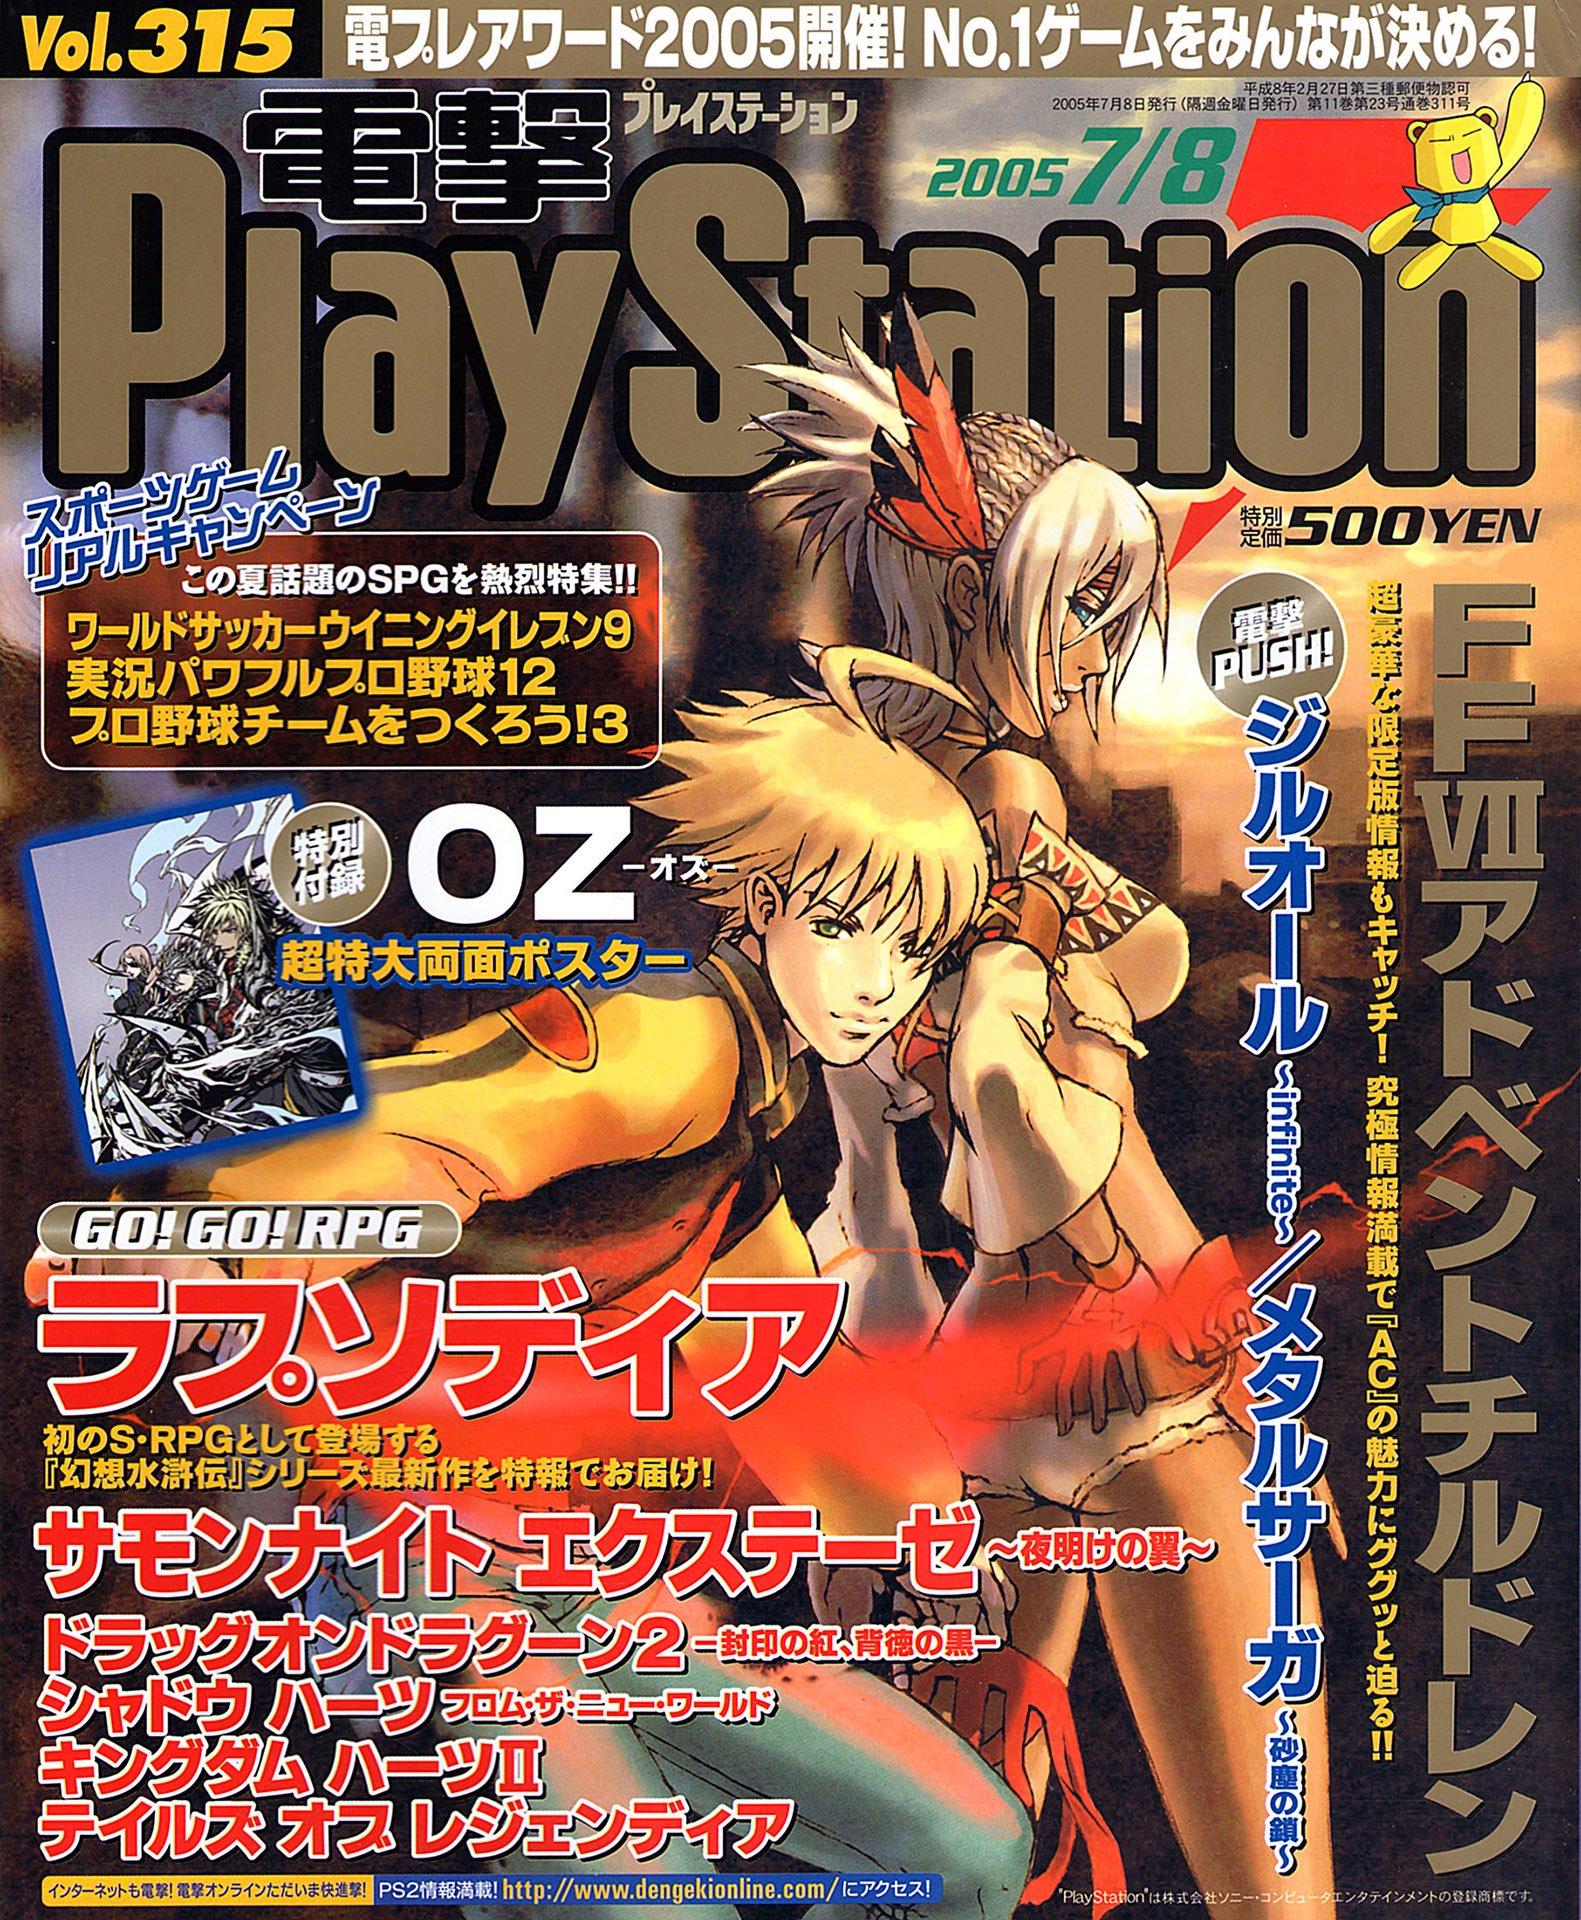 Dengeki PlayStation 315 (July 8, 2005)